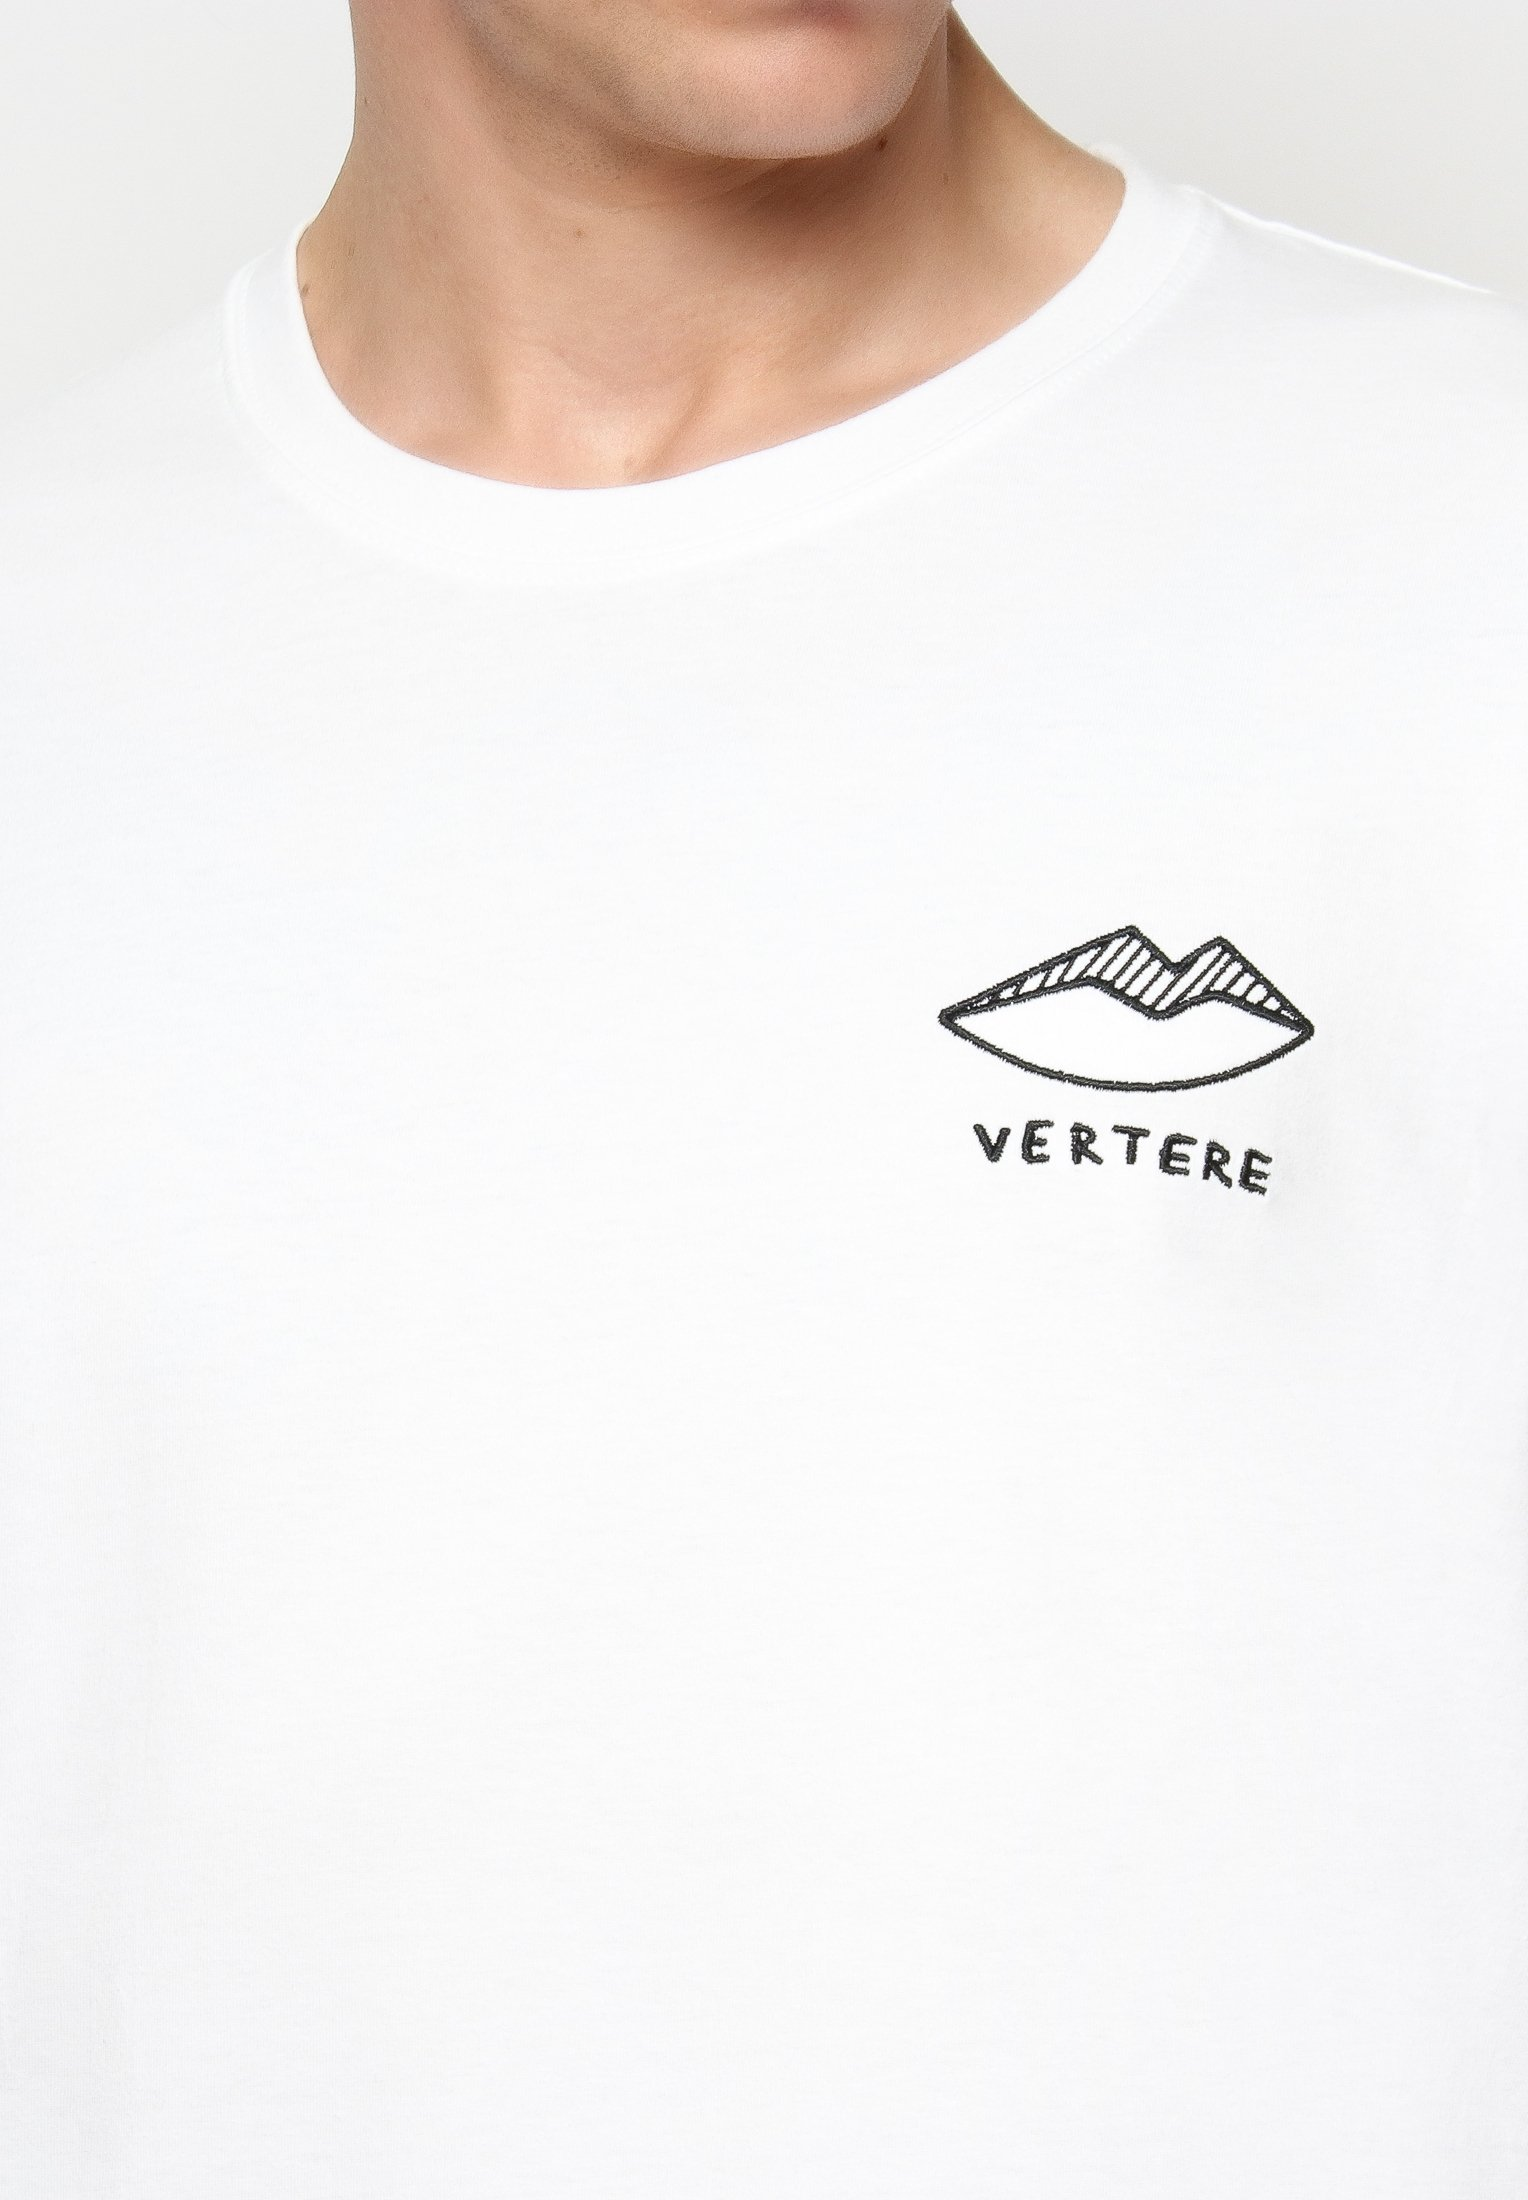 Vertere Berlin T-shirt z nadrukiem - white